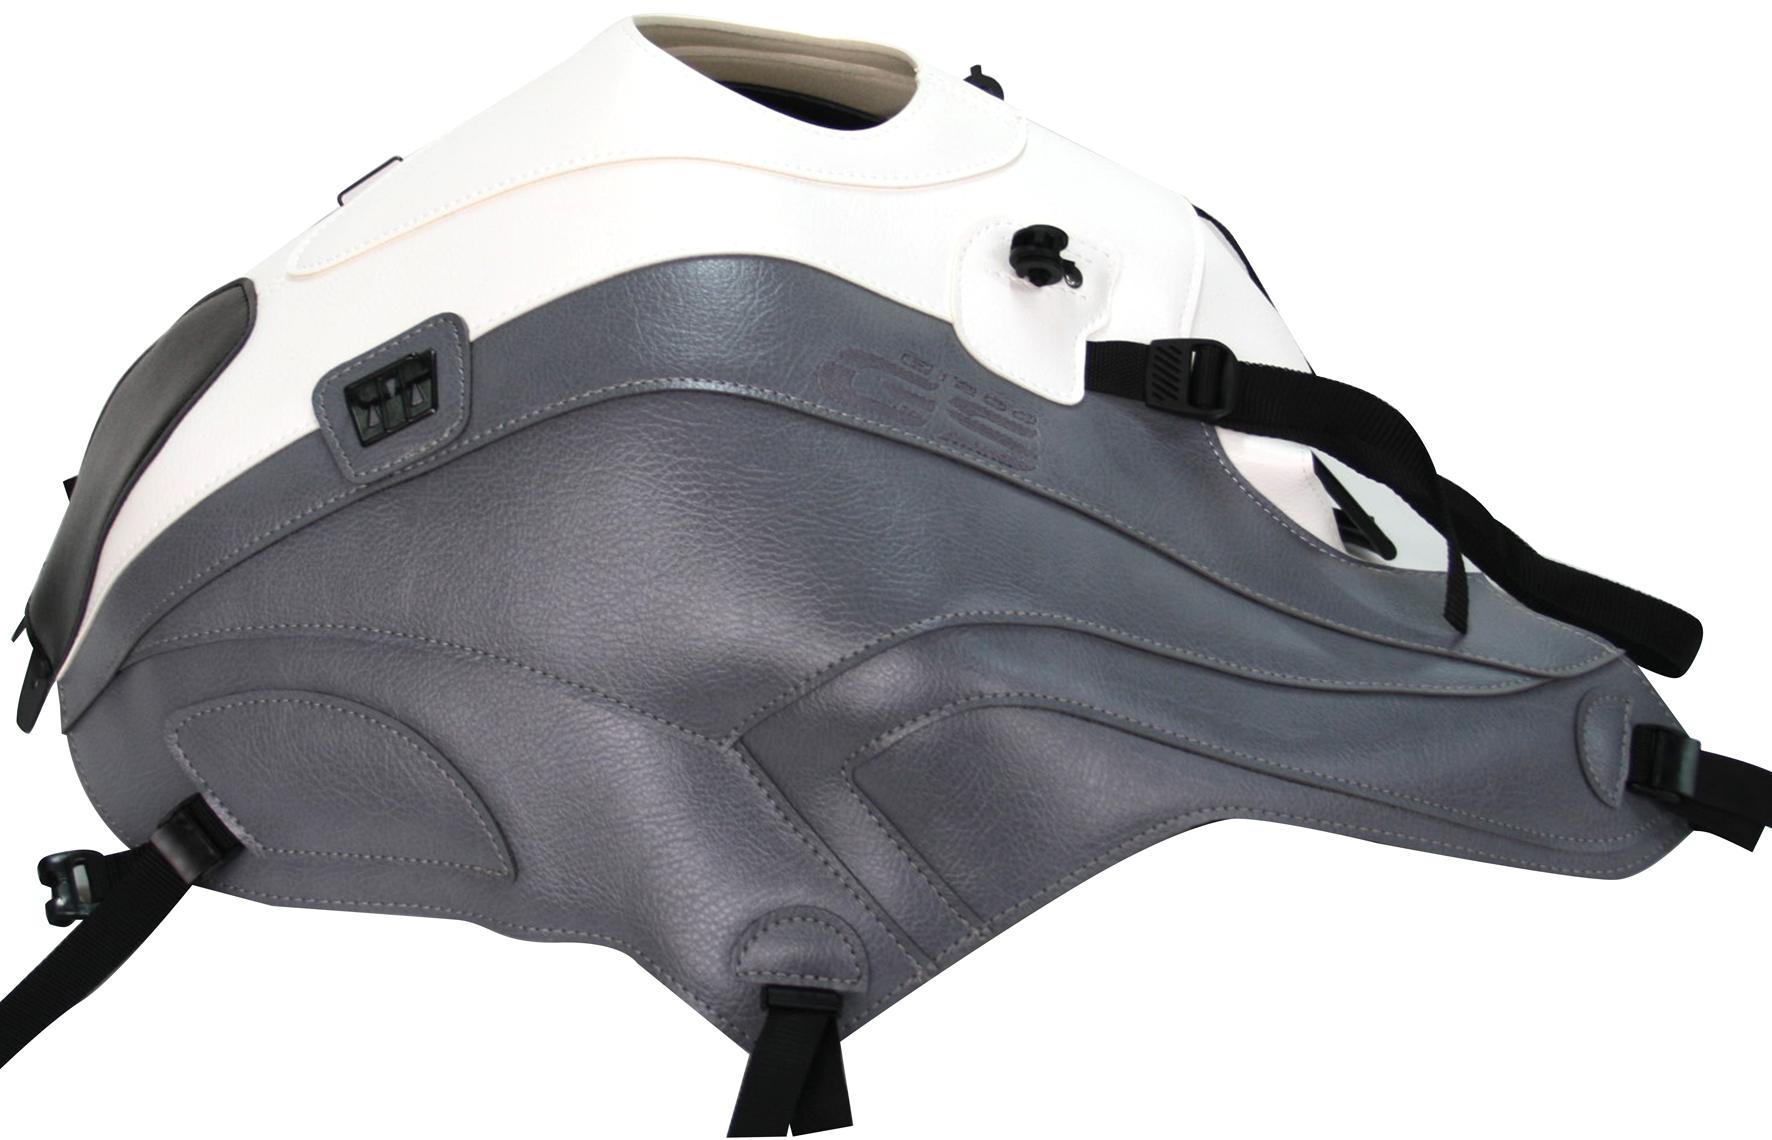 Cubredeposito Bagster para BMW R1200 GS 13-16